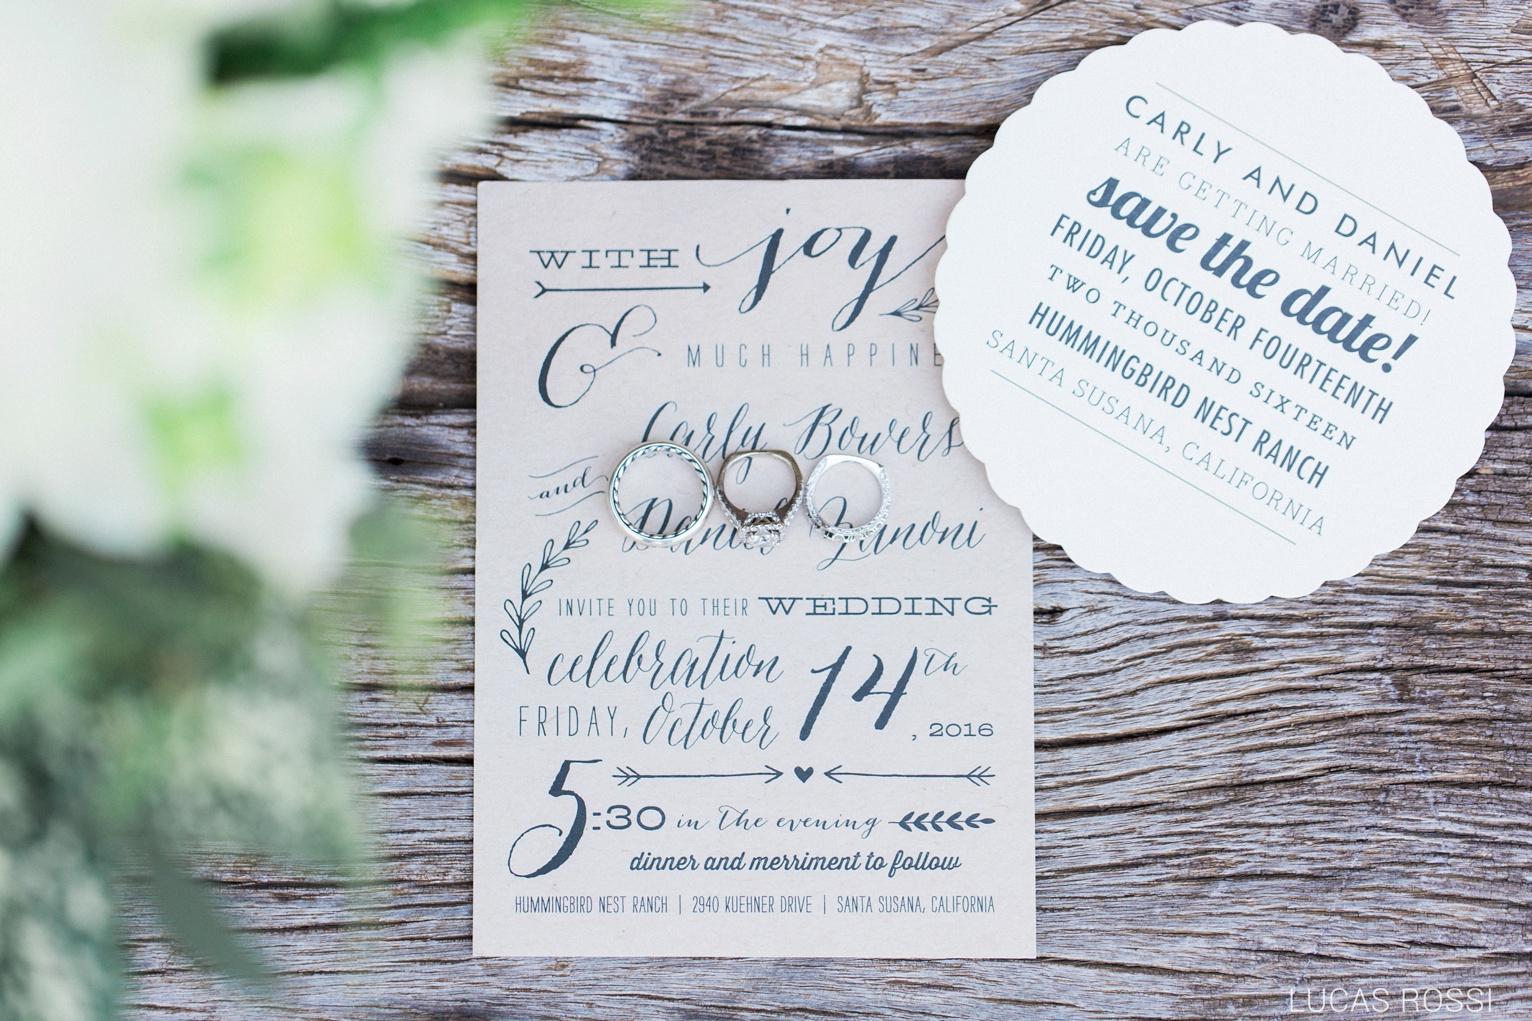 Hummindbird-Nest-Ranch-Wedding-Carly-Daniel-25